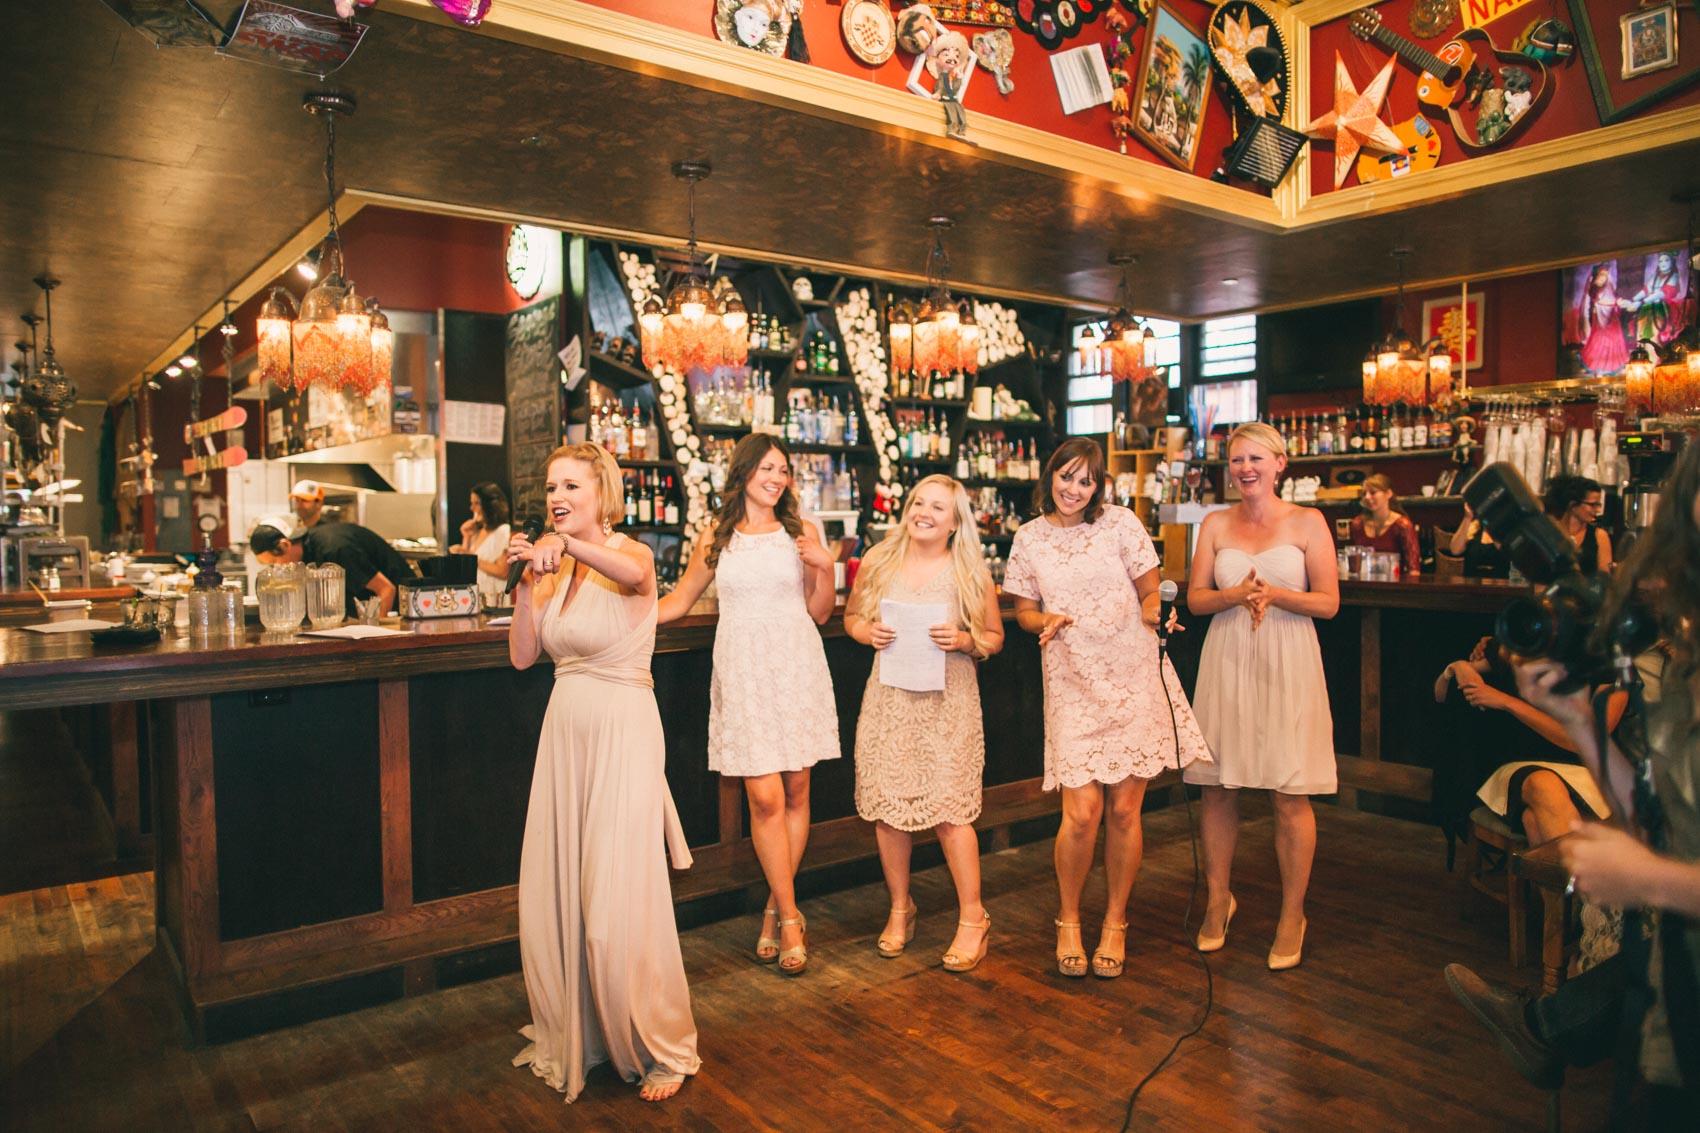 049_Crested Butte Wedding Photographer Secret Stash Woods Walk Ceremony Jamie Blue Bird Events Boho Epic Stars